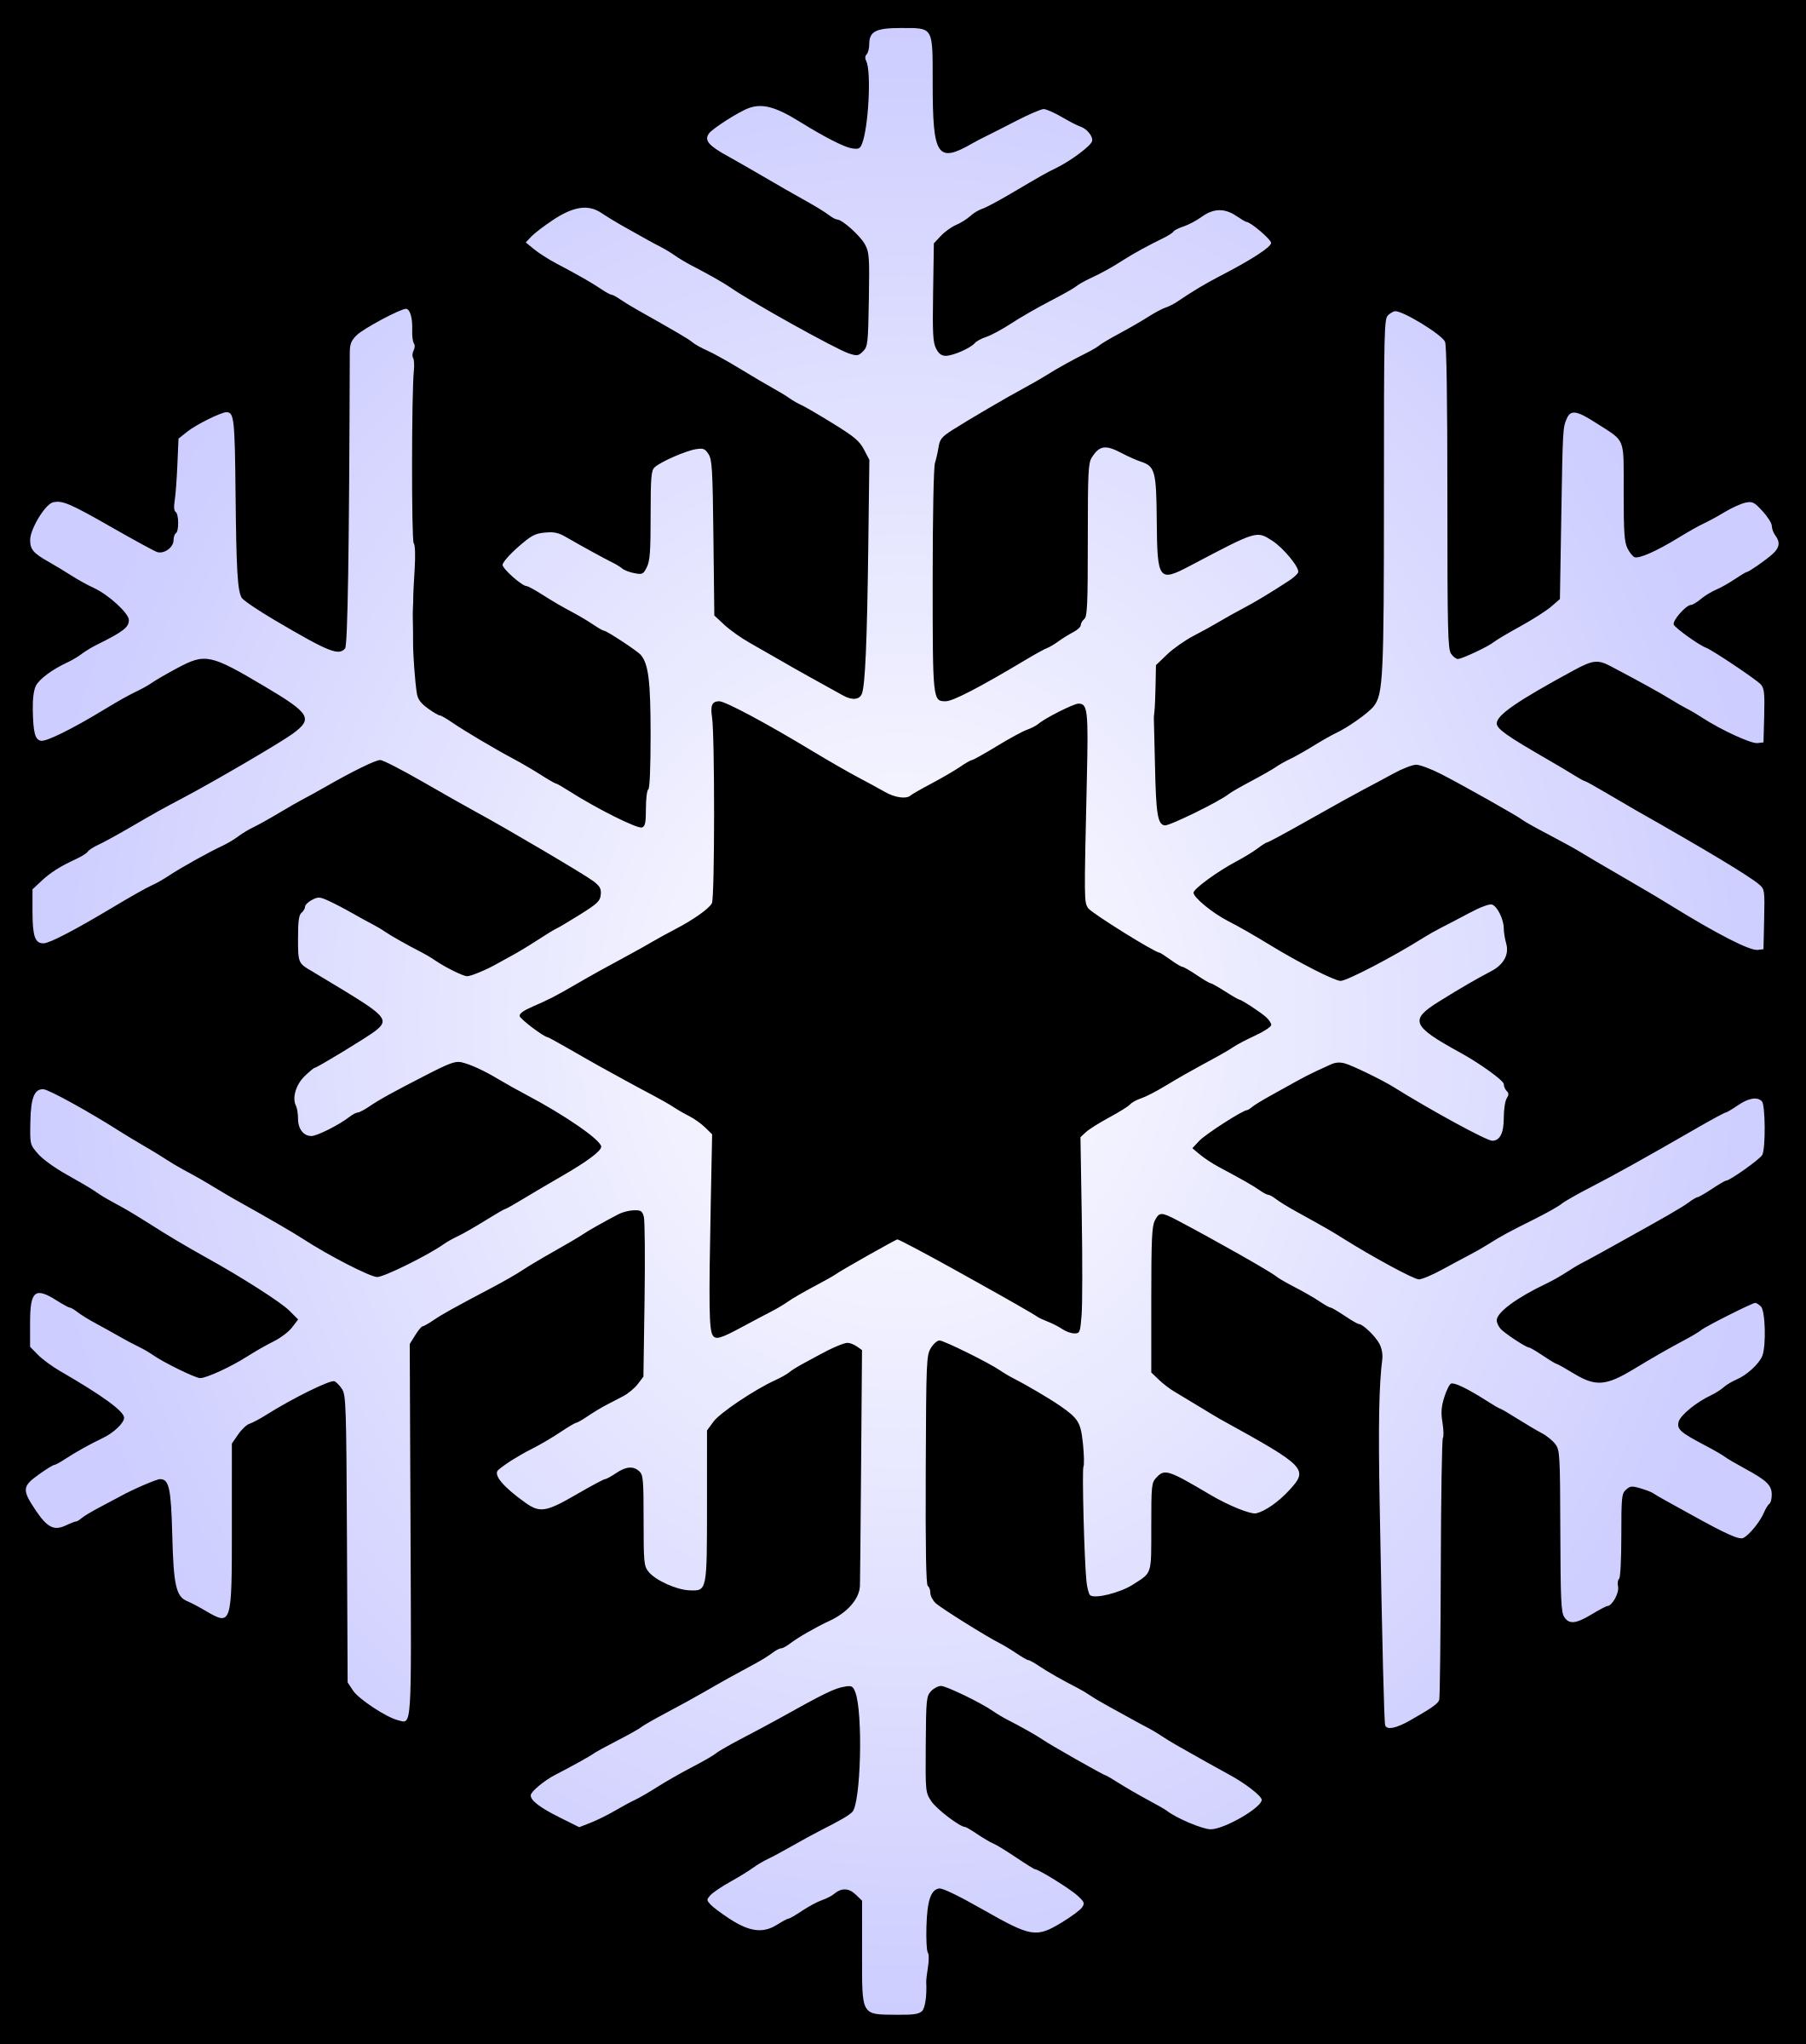 2120x2400 Extraordinary Inspiration Clipart Snowflake Snowflakes Free Public